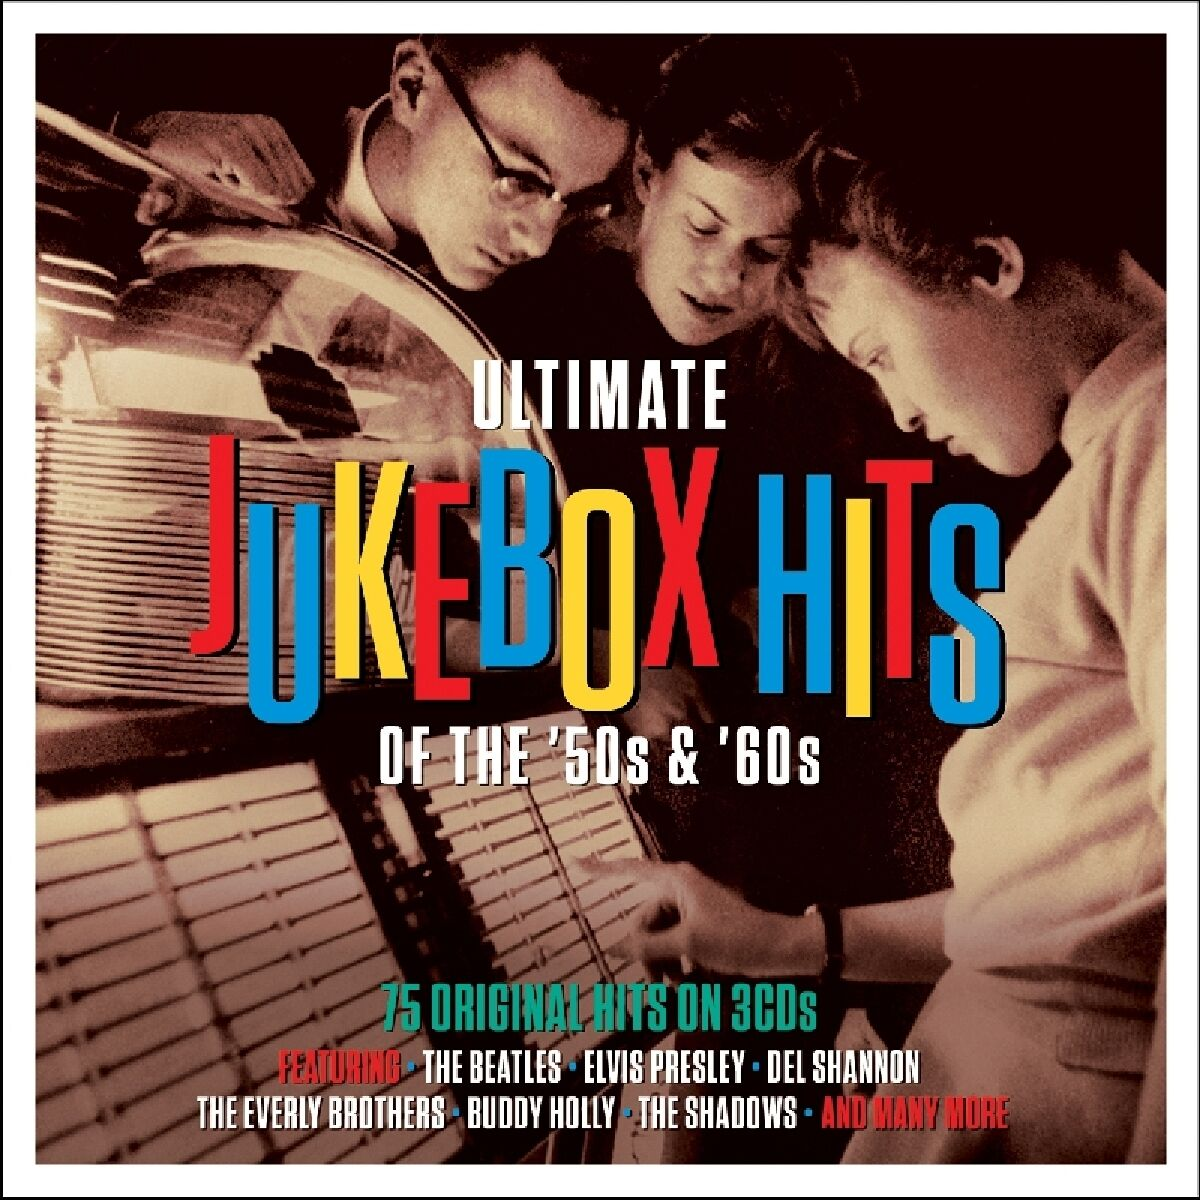 Ultimate Jukebox Hits Of The 50s & 60s BEST OF 75 SONGS Esse